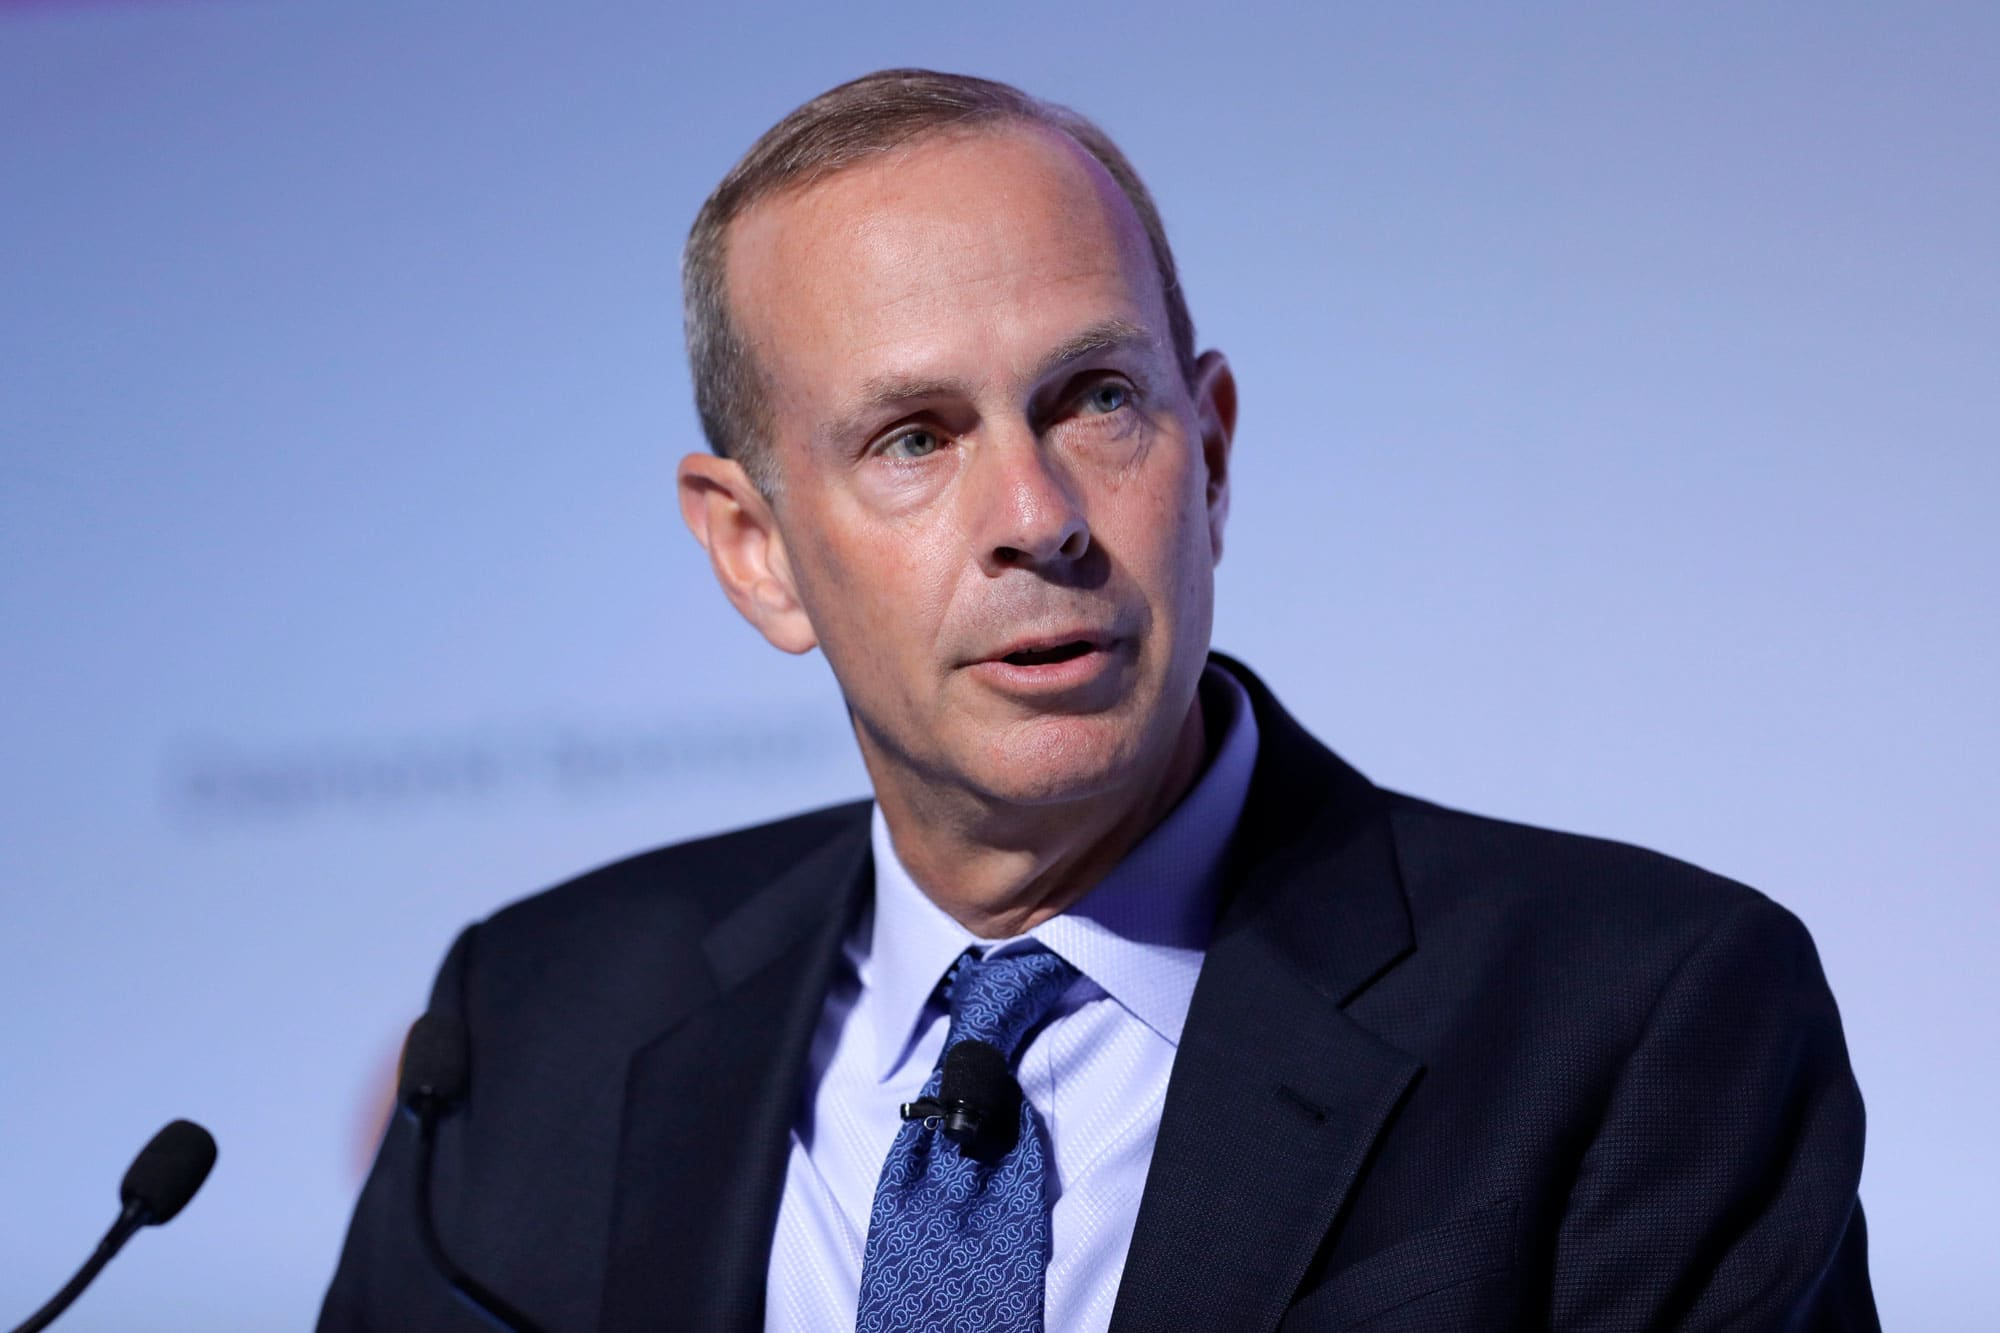 Chevron CEO defends massive write down, saying good performance 'isn't good enough'